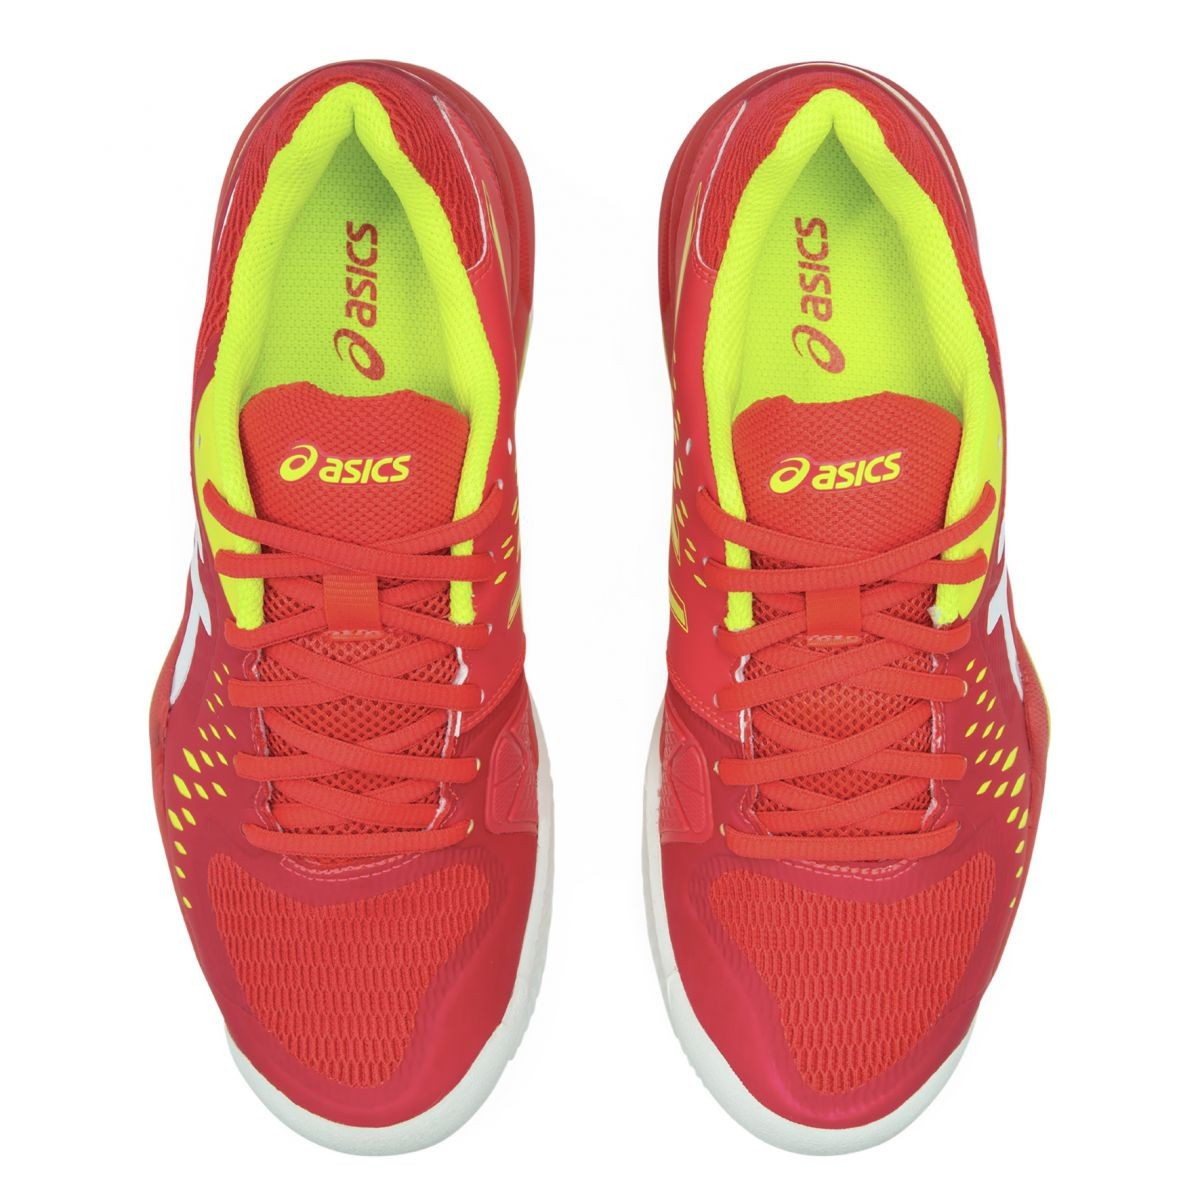 Tênis Asics Gel-Challenger 12 Clay Feminino - Rosa Neon Amarelo